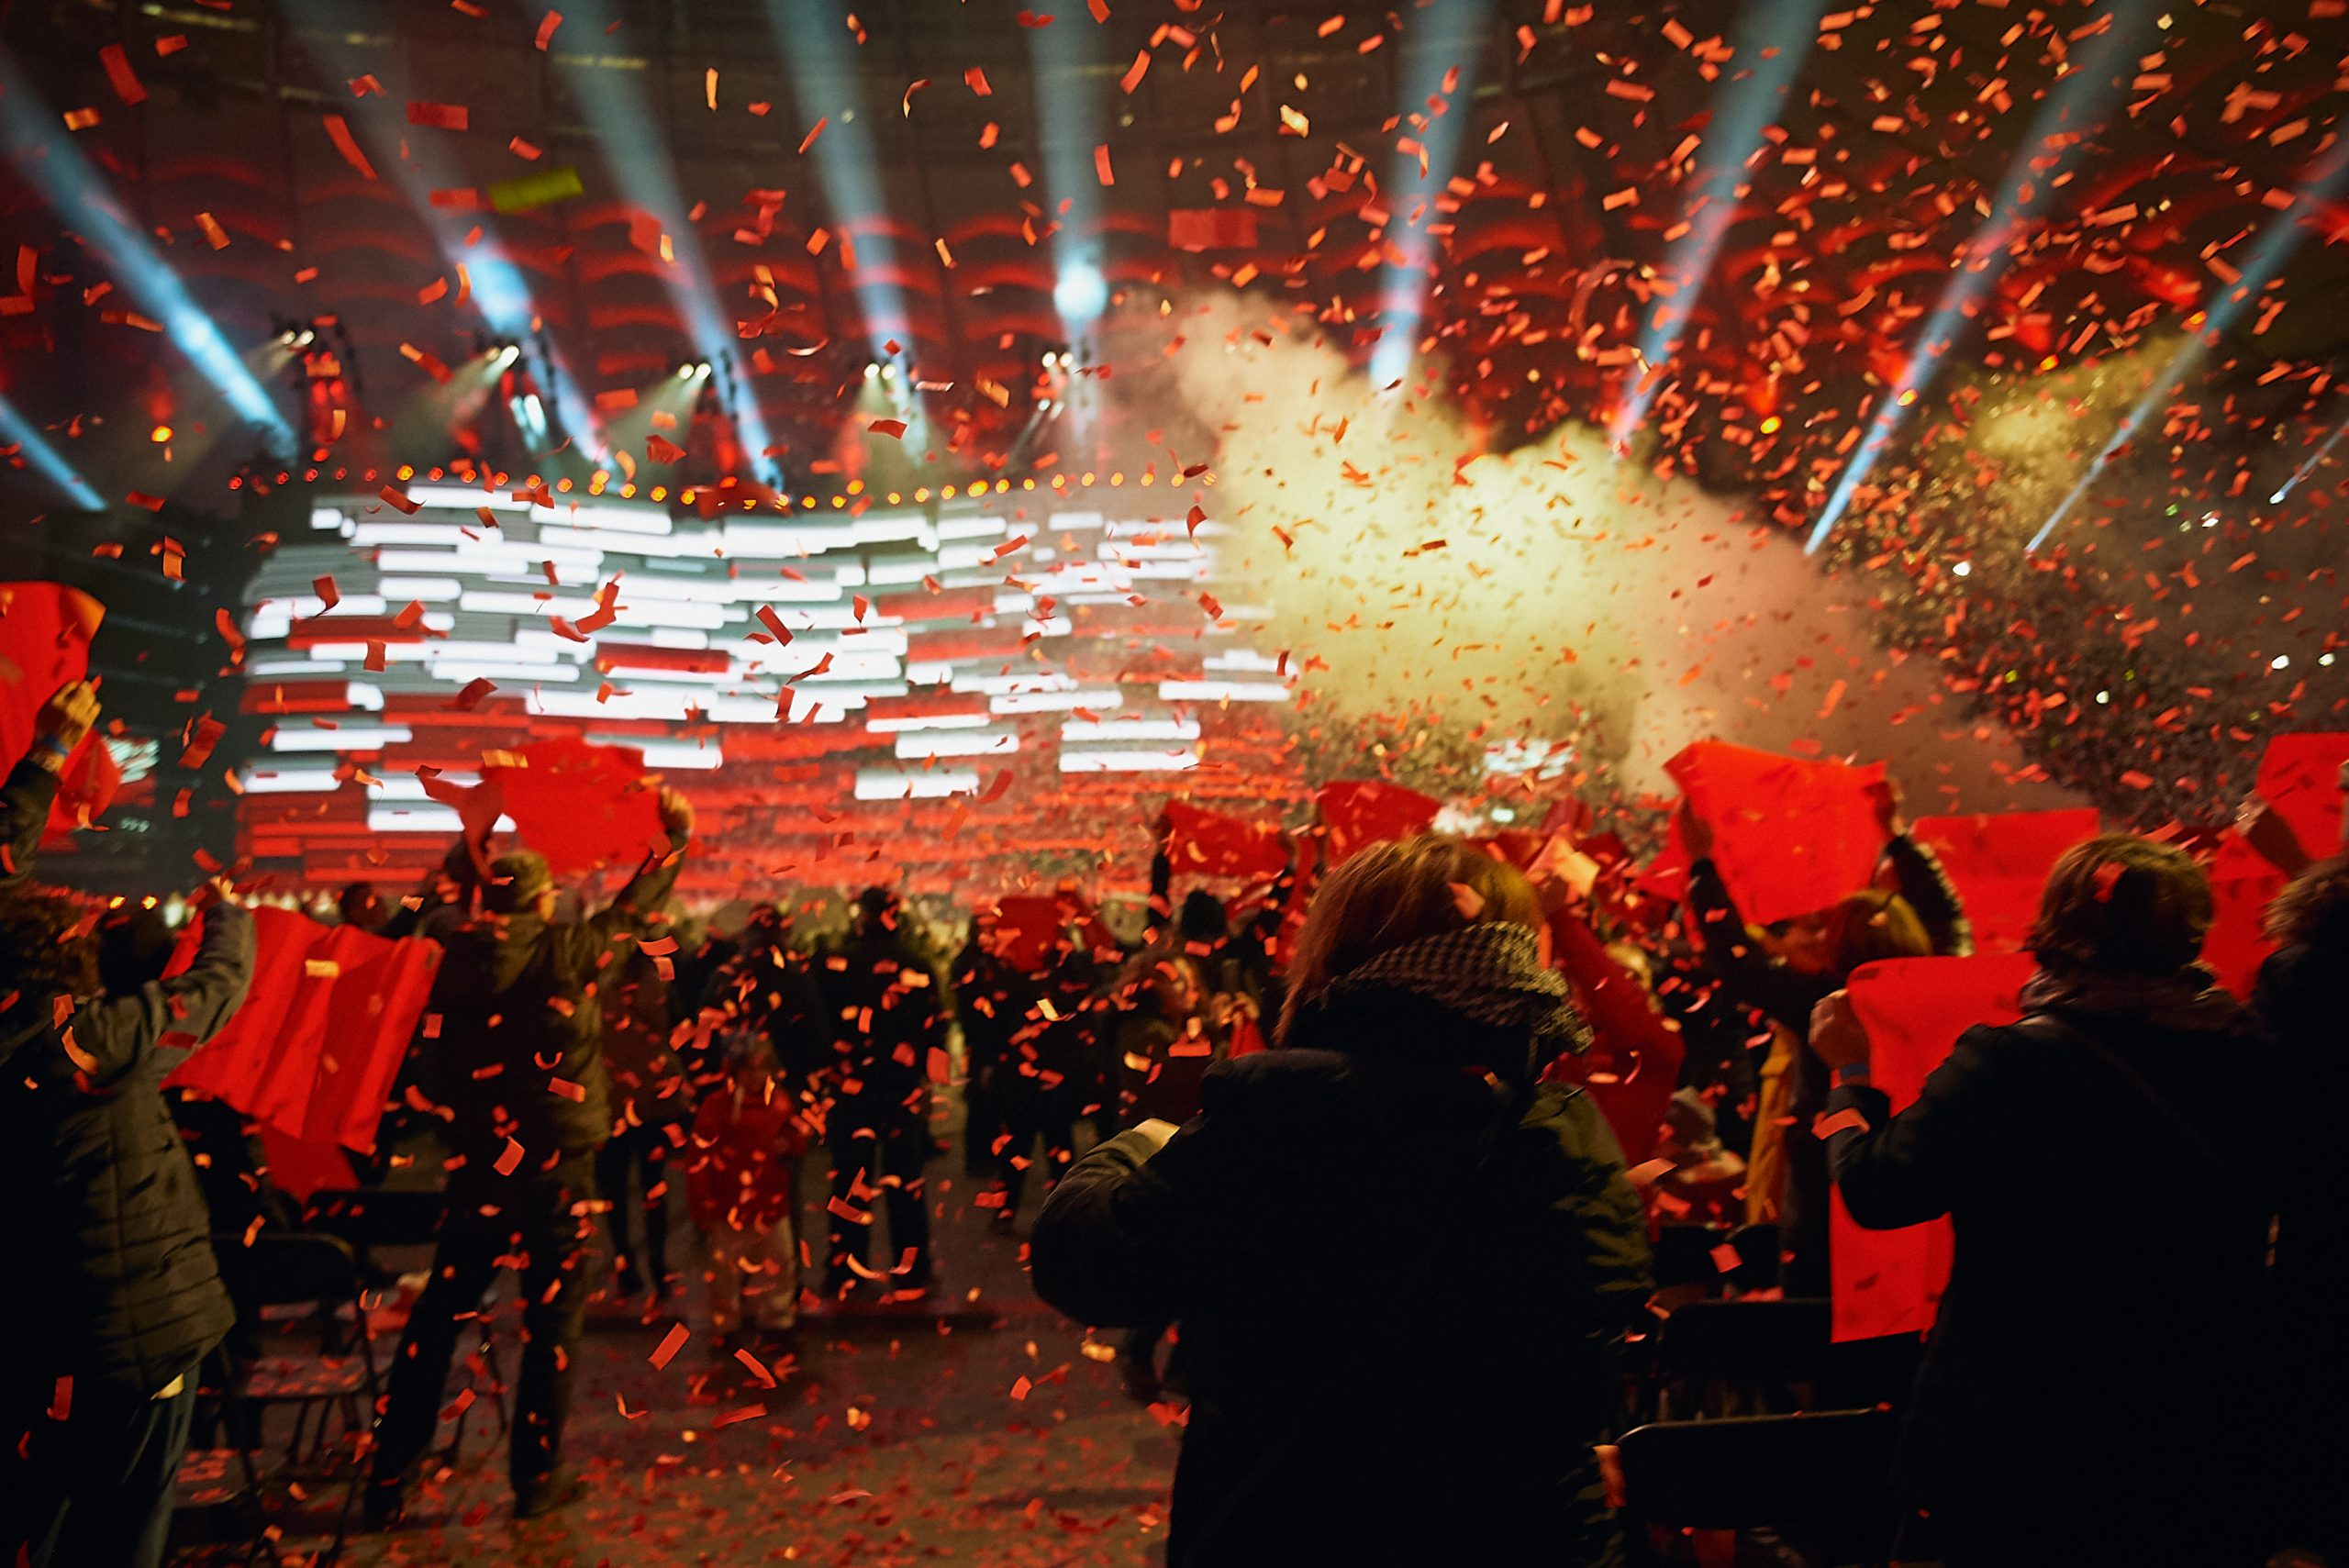 White and red illuminations, confetti in patriotic colours falling over spectators